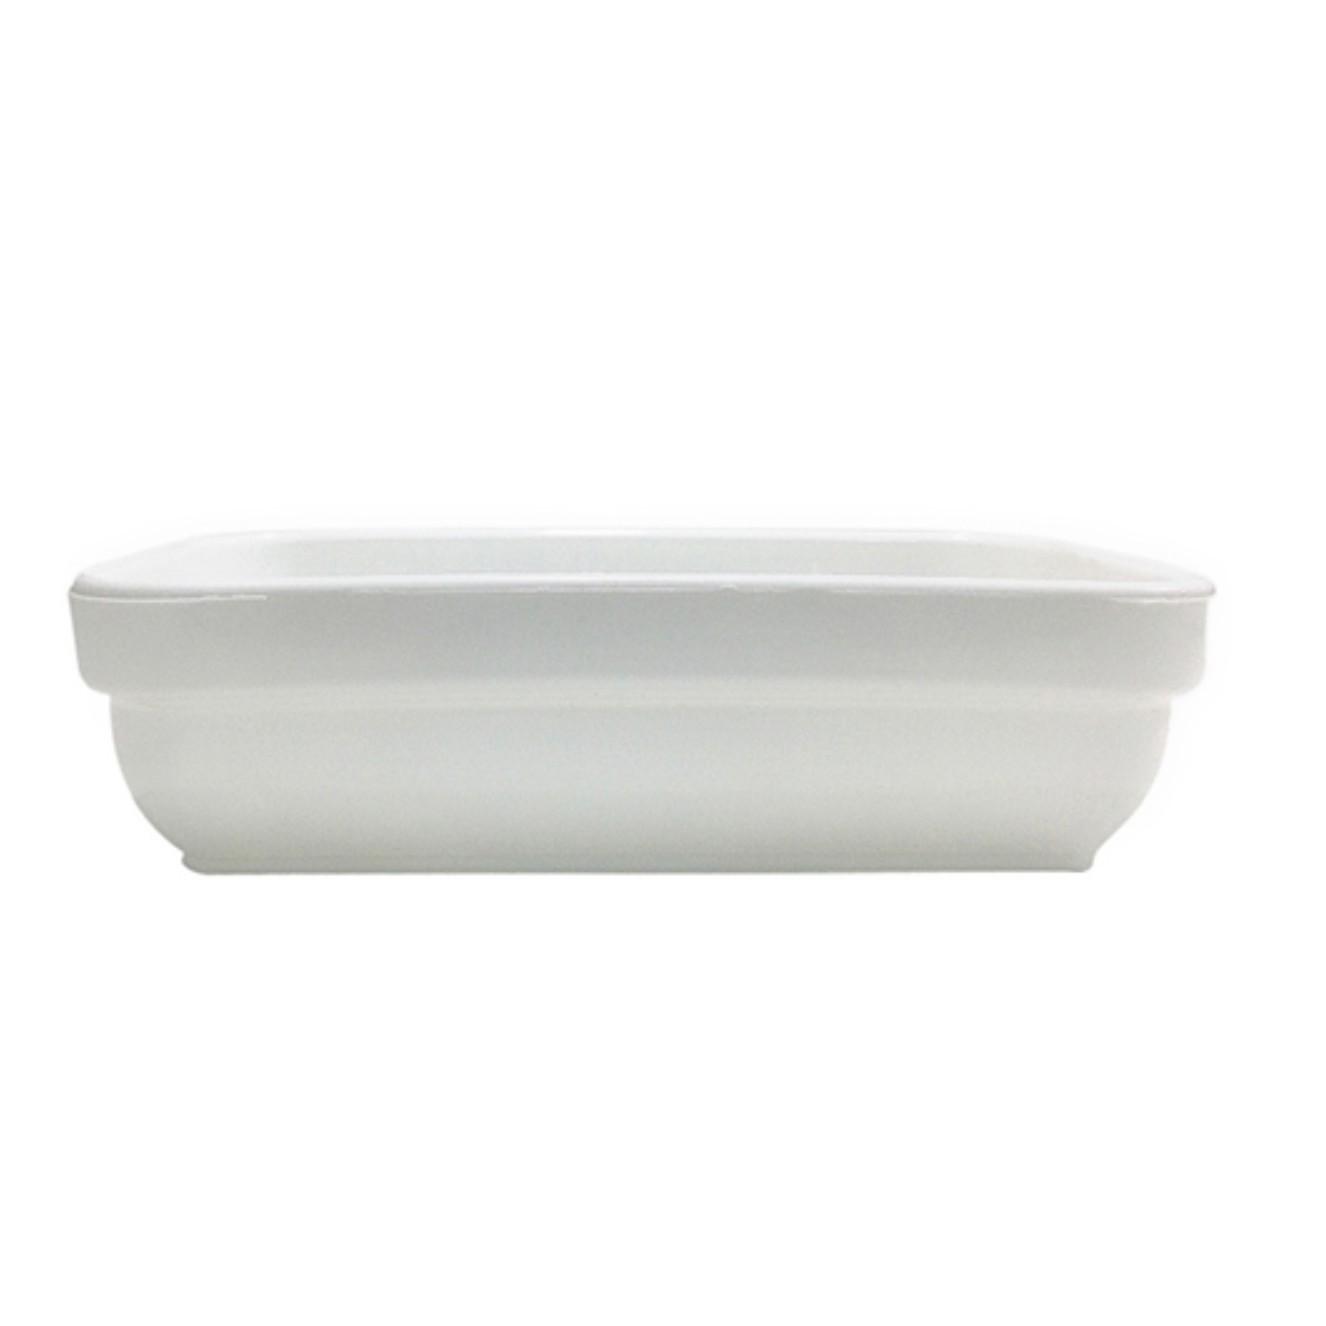 Travessa de Plastico Cheff 14x9cm - 619 - Vem Plast